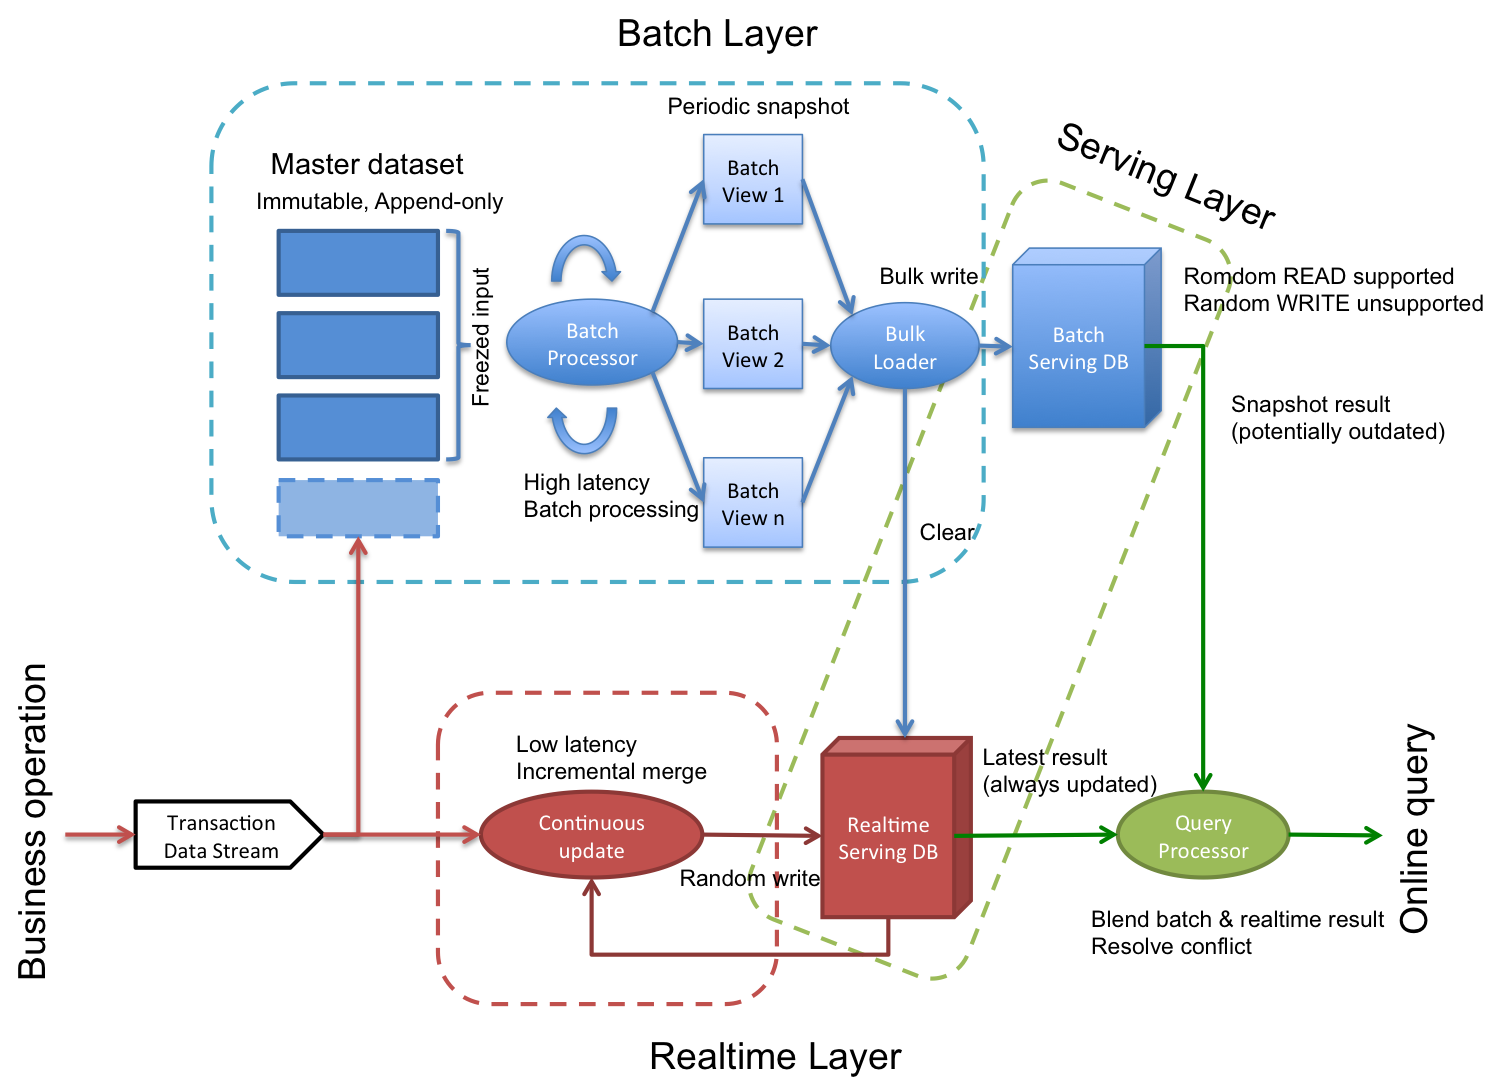 Java 3 Tier Architecture Diagram Trane Rtac Chiller Wiring Lambda Principles Dzone Integration